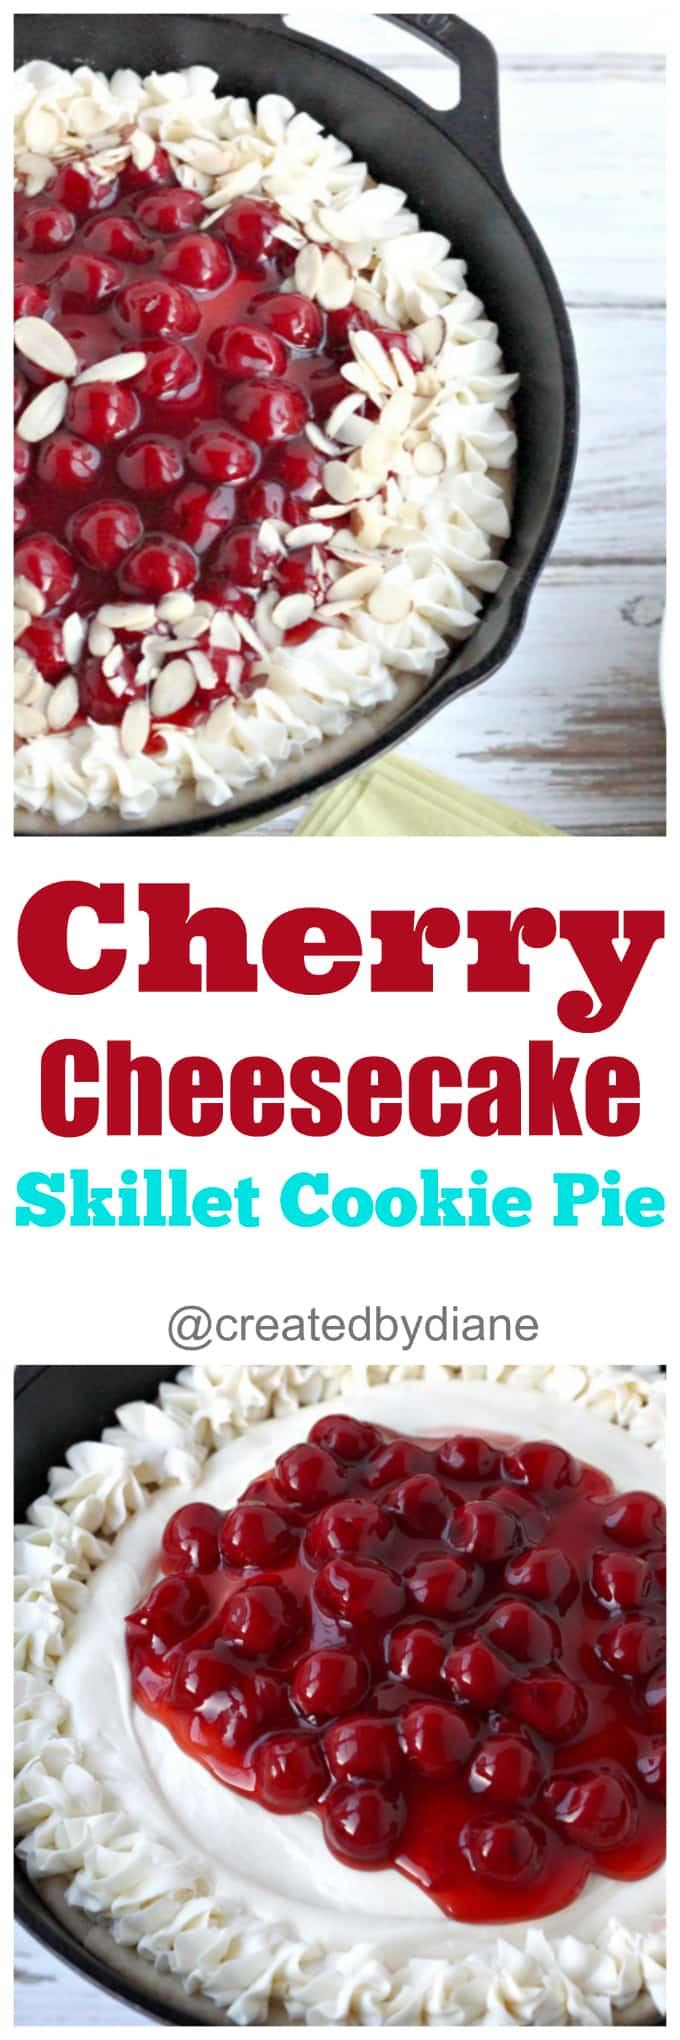 cherry cheesecake skillet cookie pie easy recipe @createdbydiane